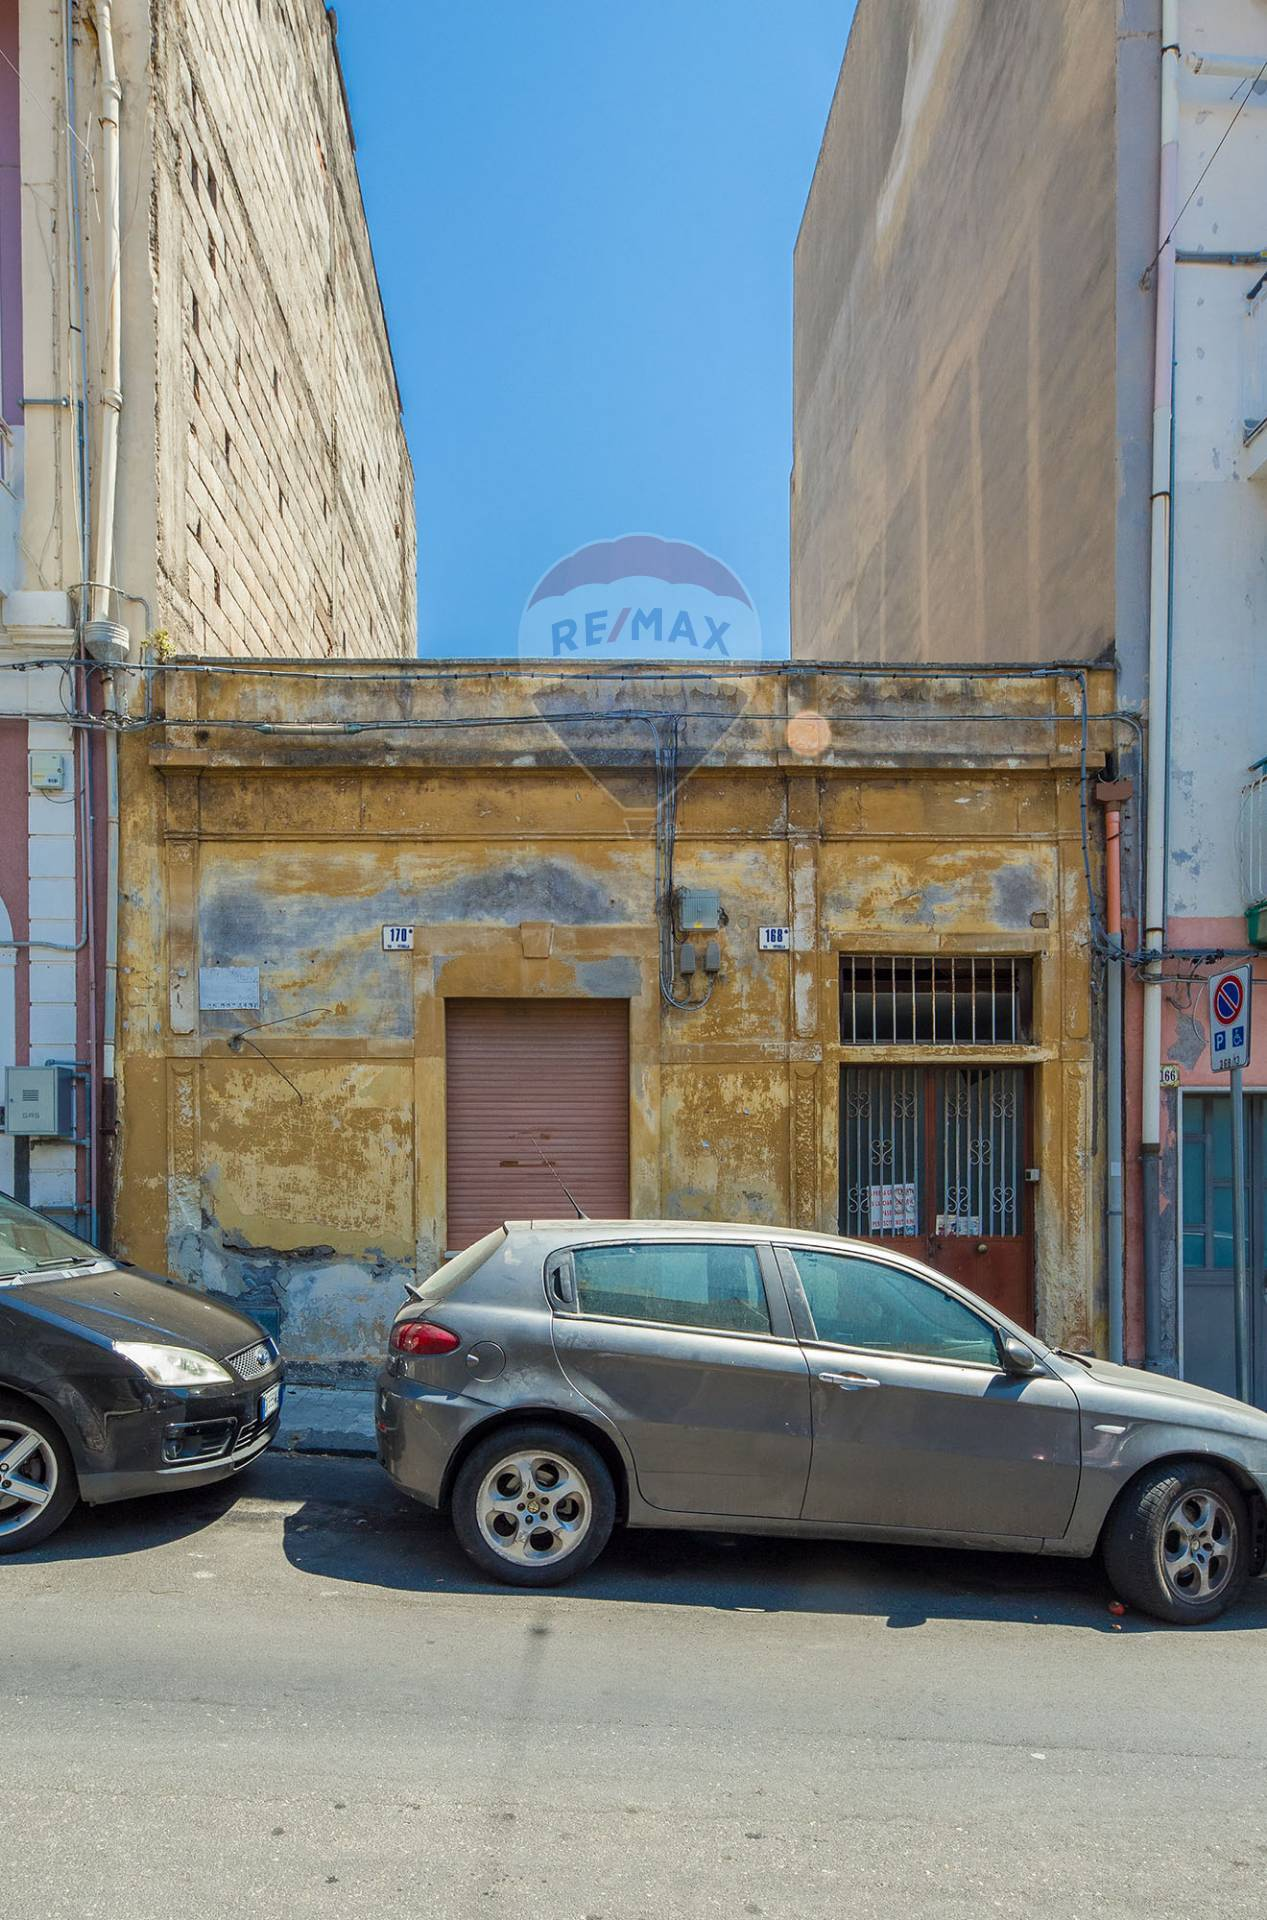 catania vendita quart: catania-ognina,picanello,ulisse re/max city home